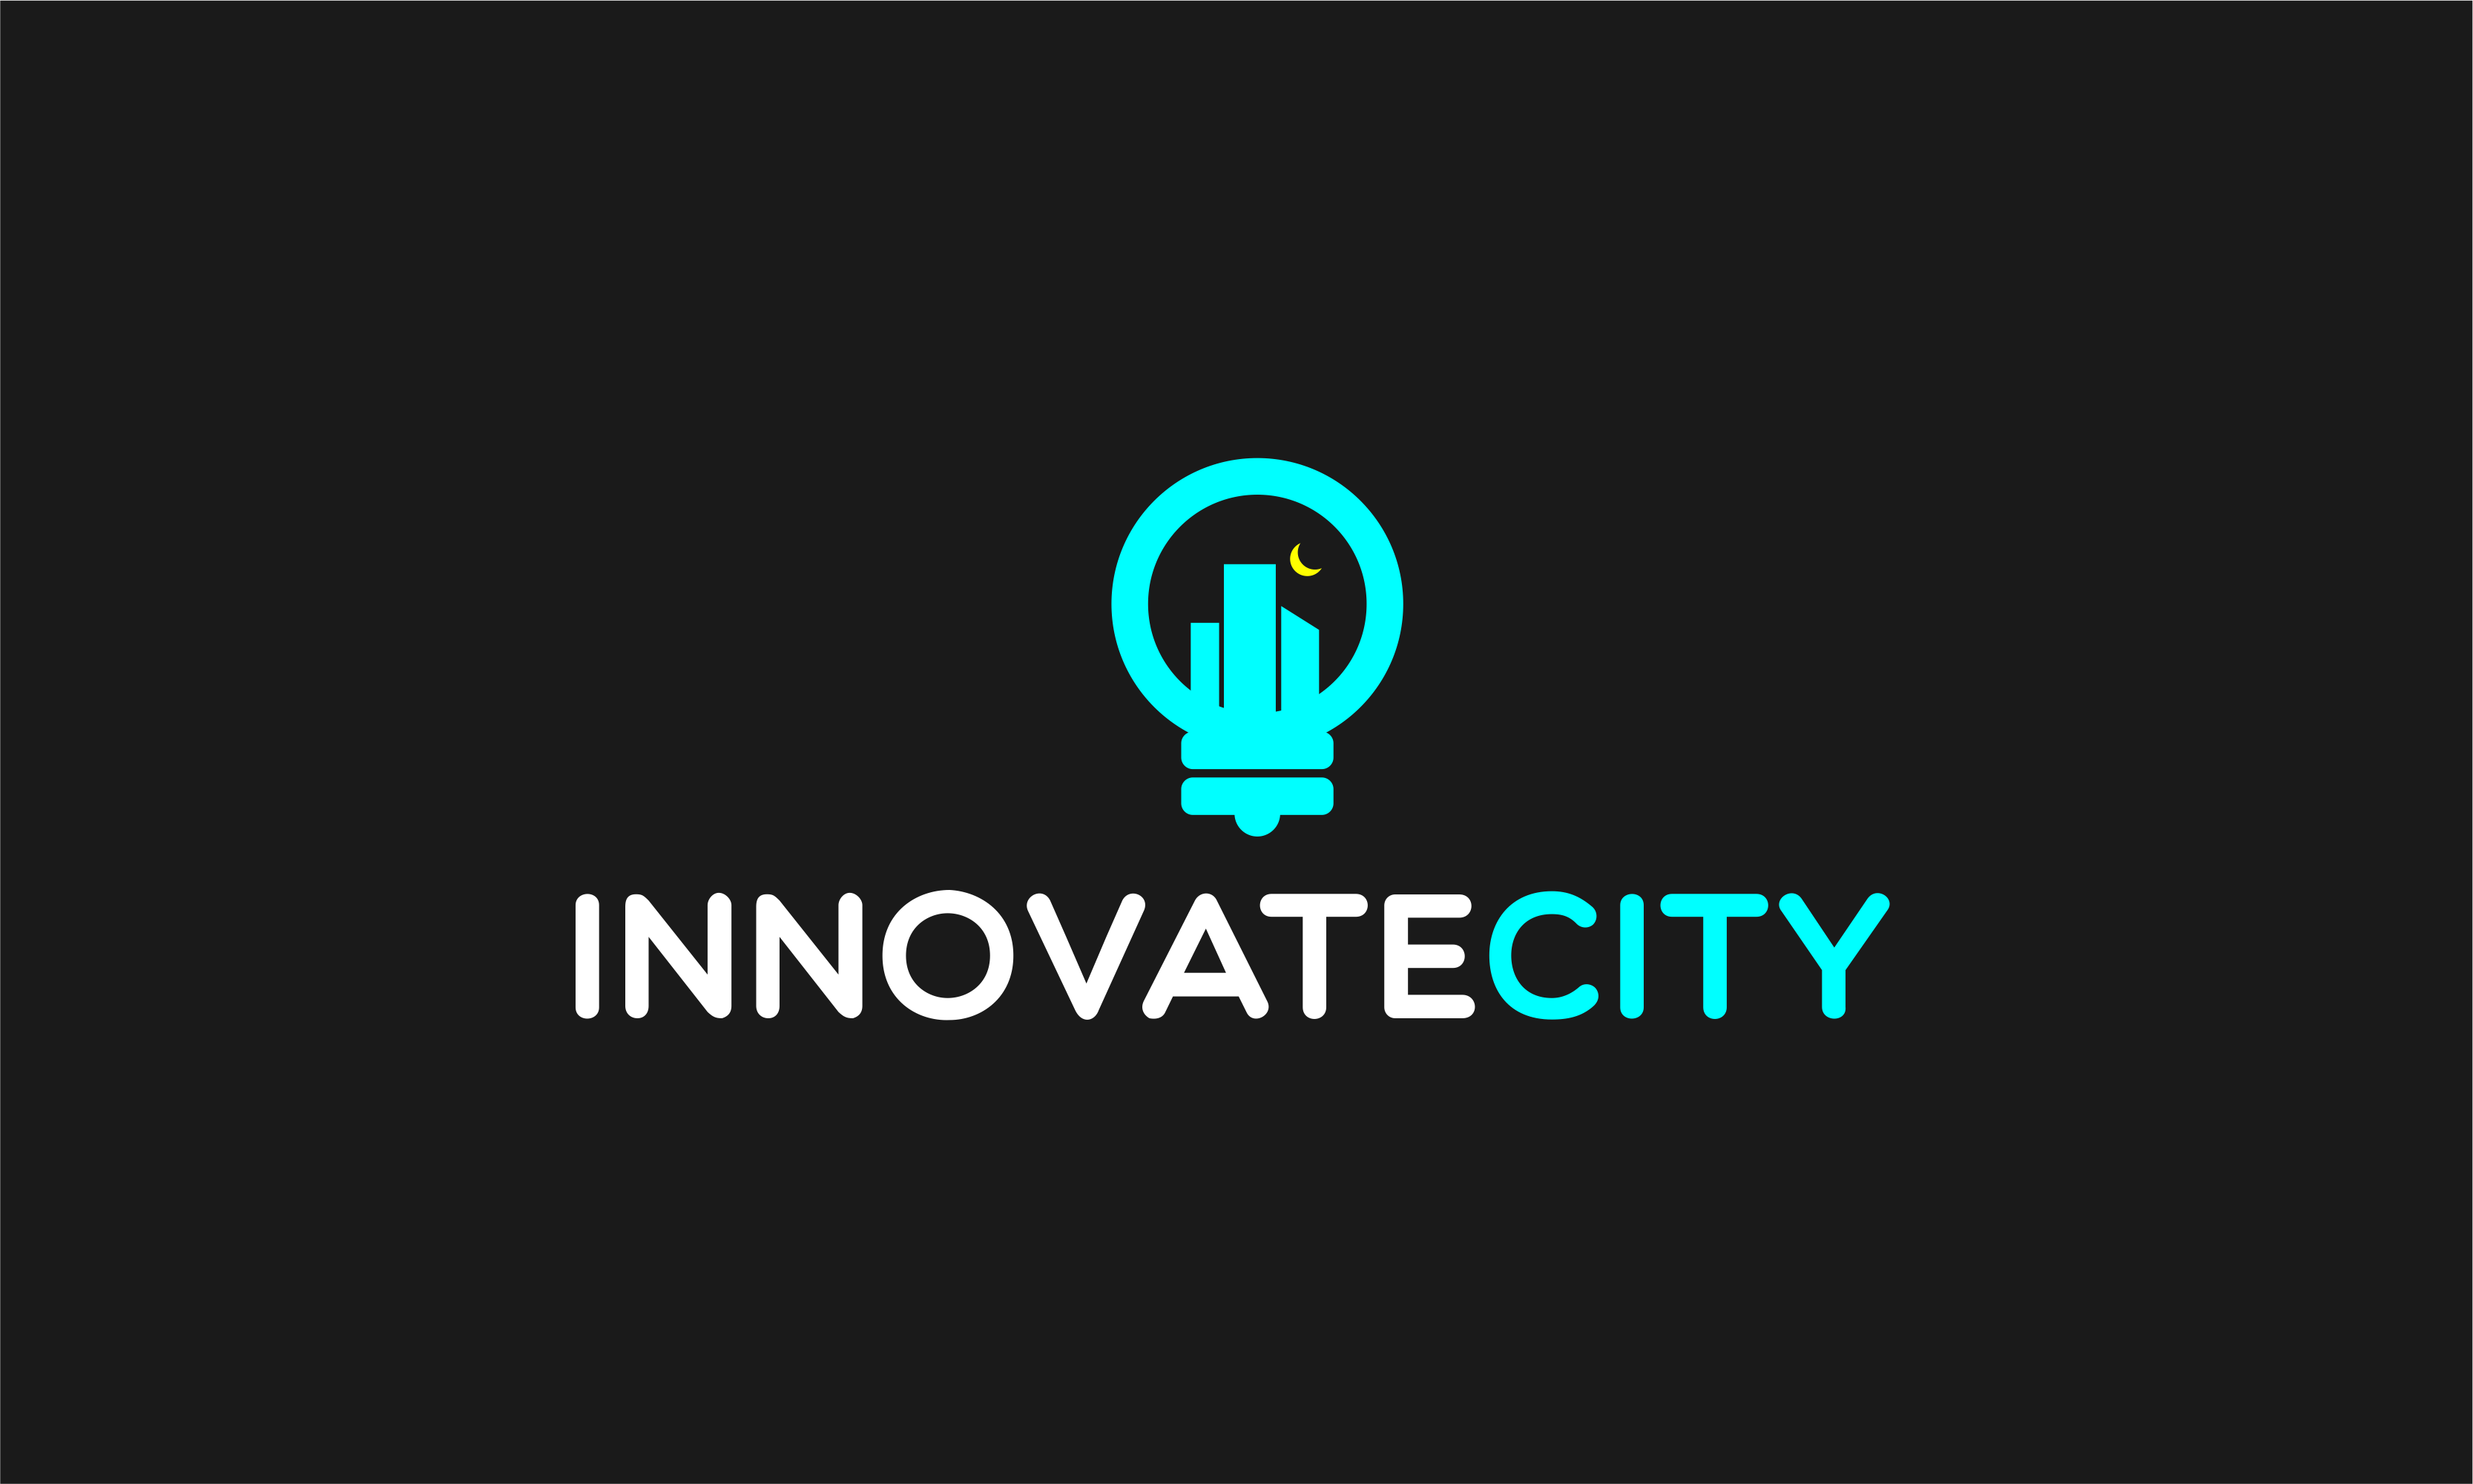 Innovatecity